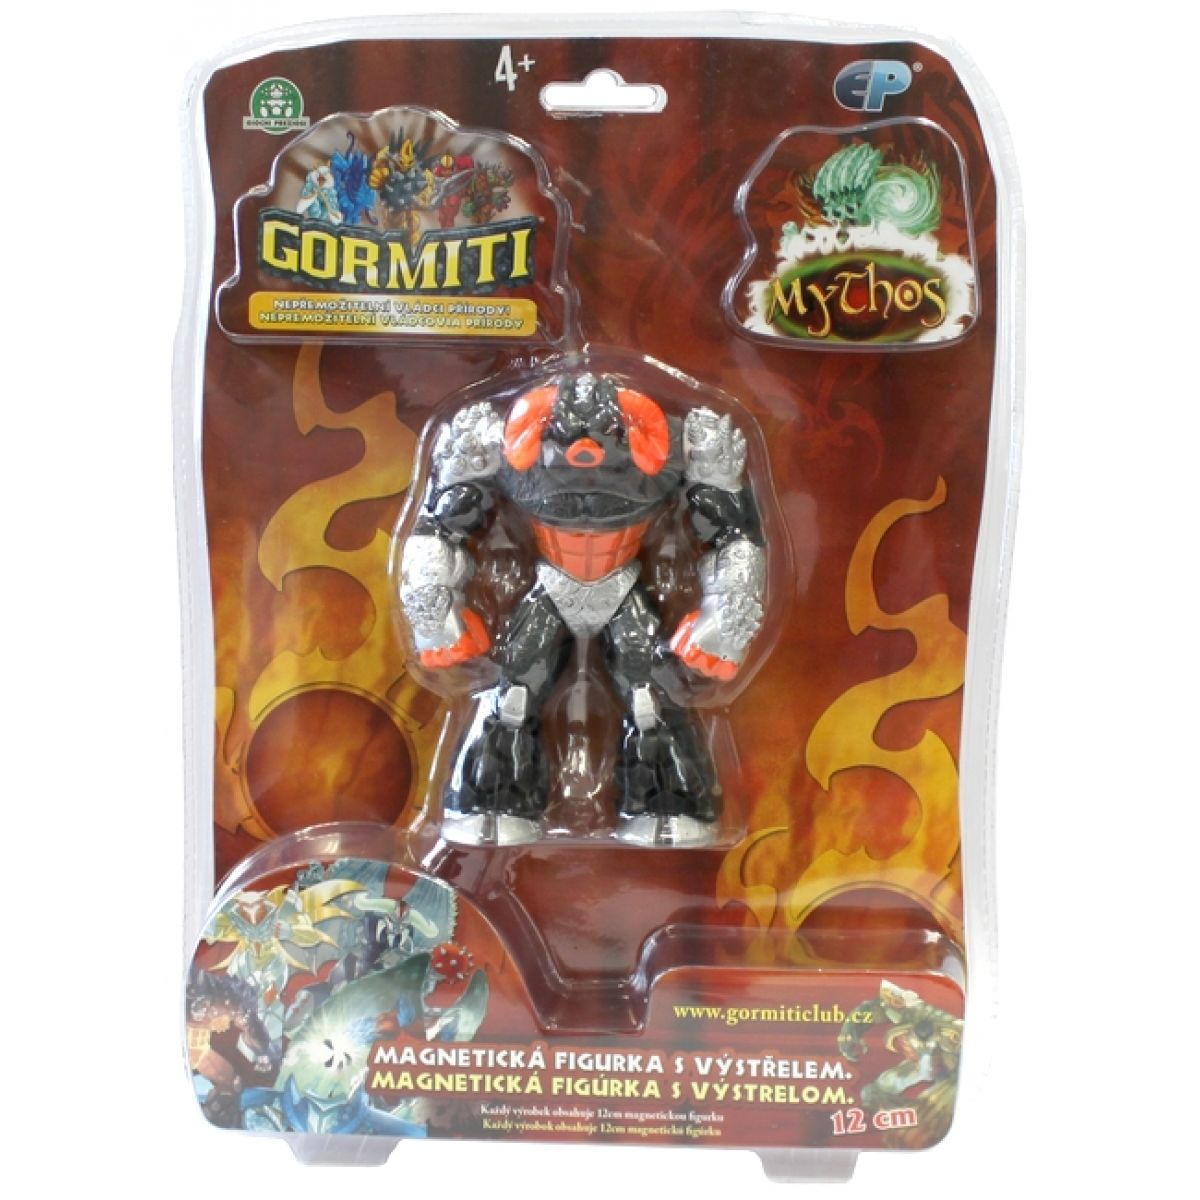 Gormiti Mythos 12cm magnetická figurka - Pán Země